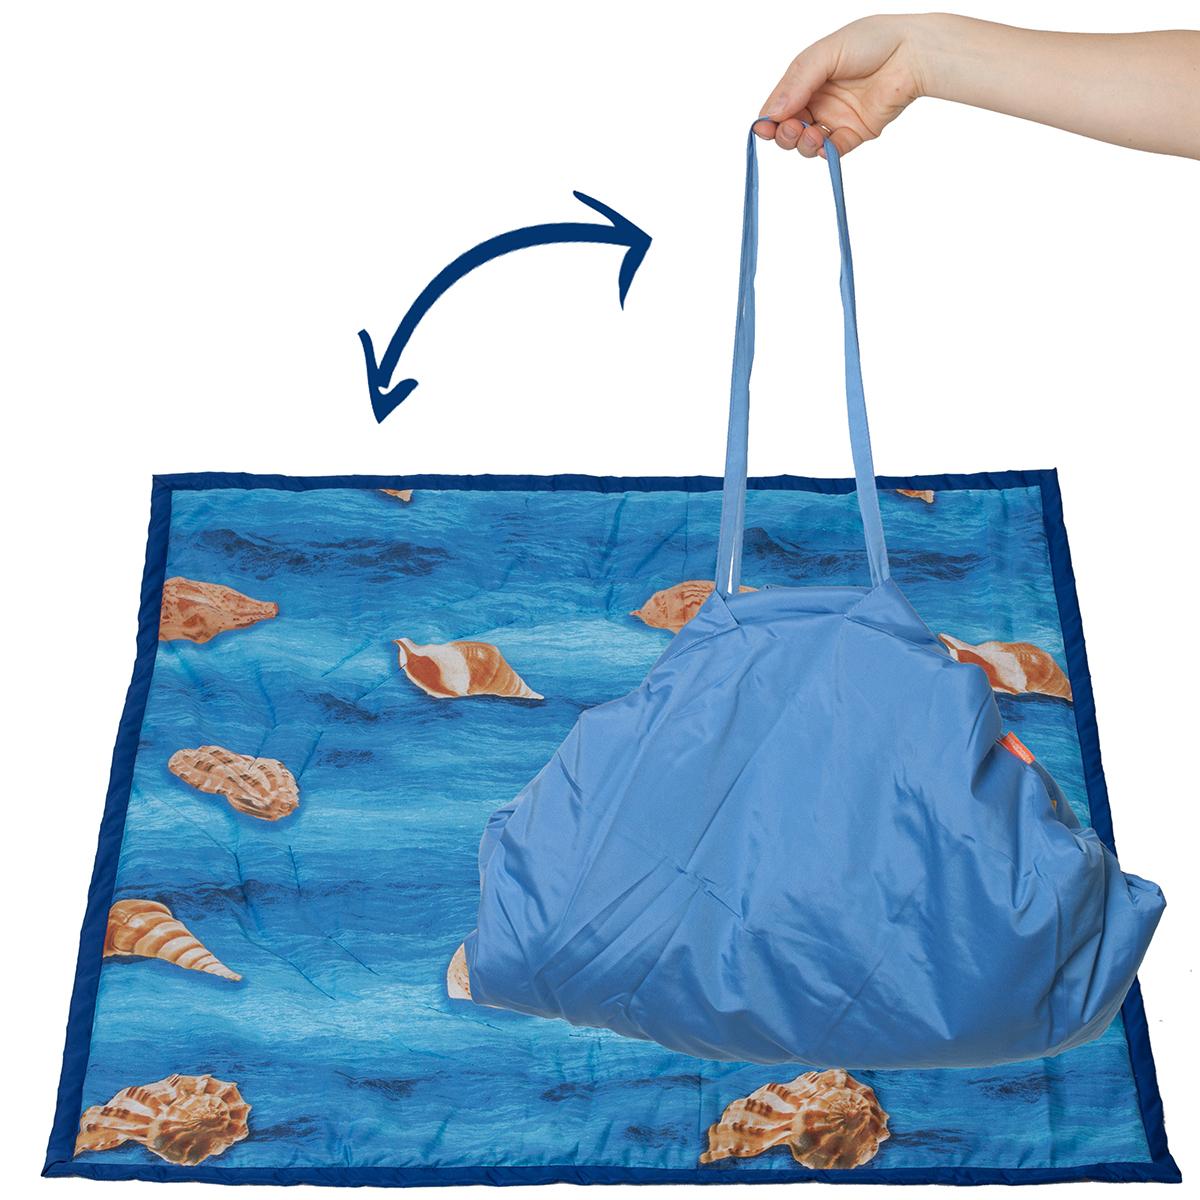 Чудо-Чадо Переносной коврик-сумка цвет синий ракушки - Сумки для мам